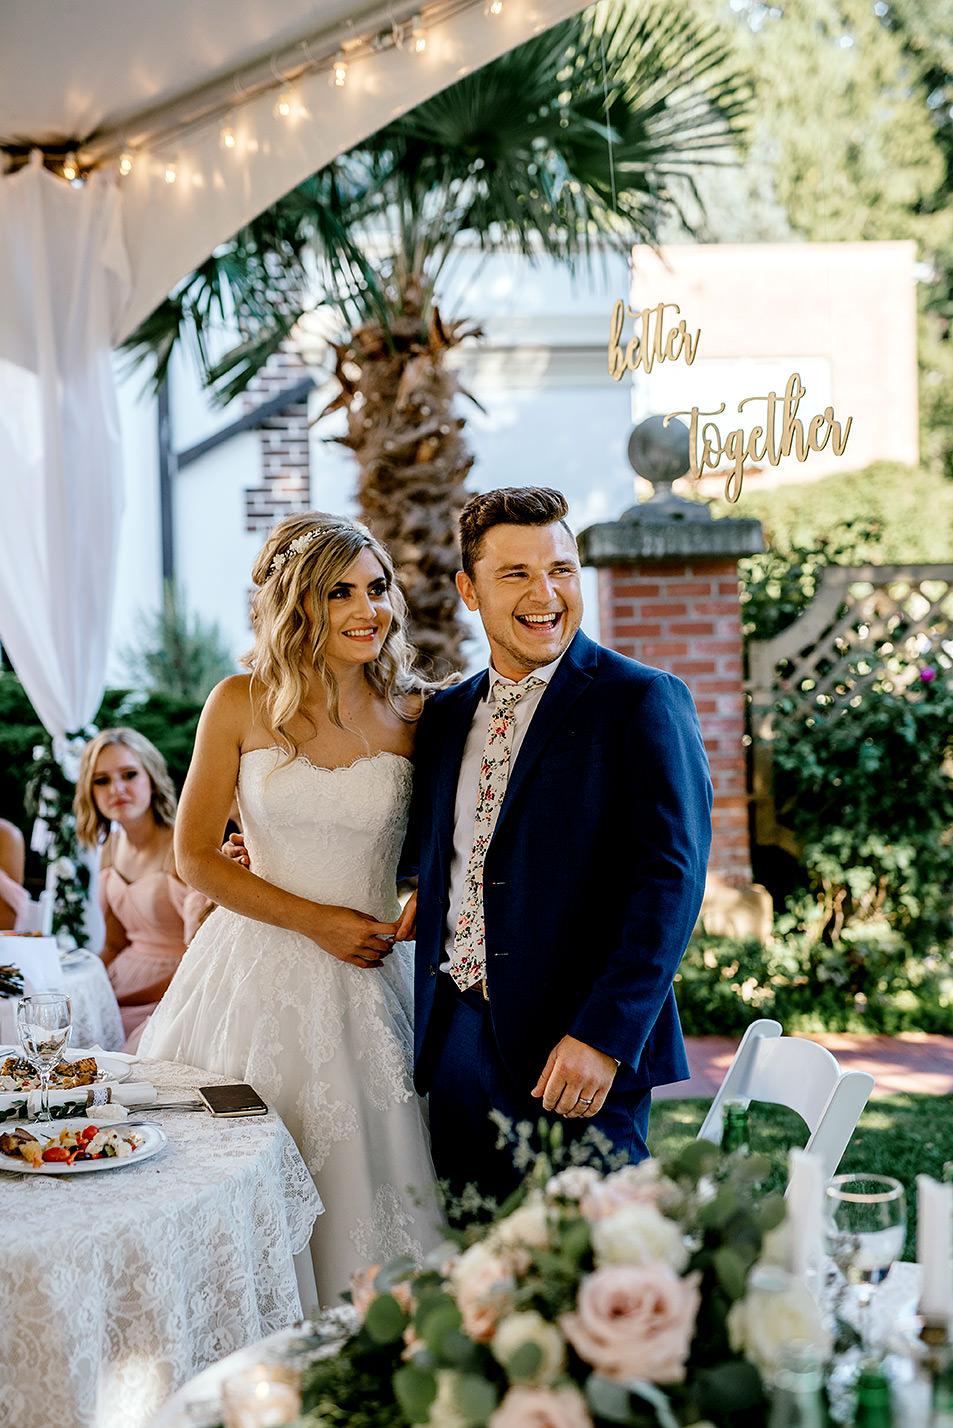 Lairmont_Manor_Wedding174.jpg